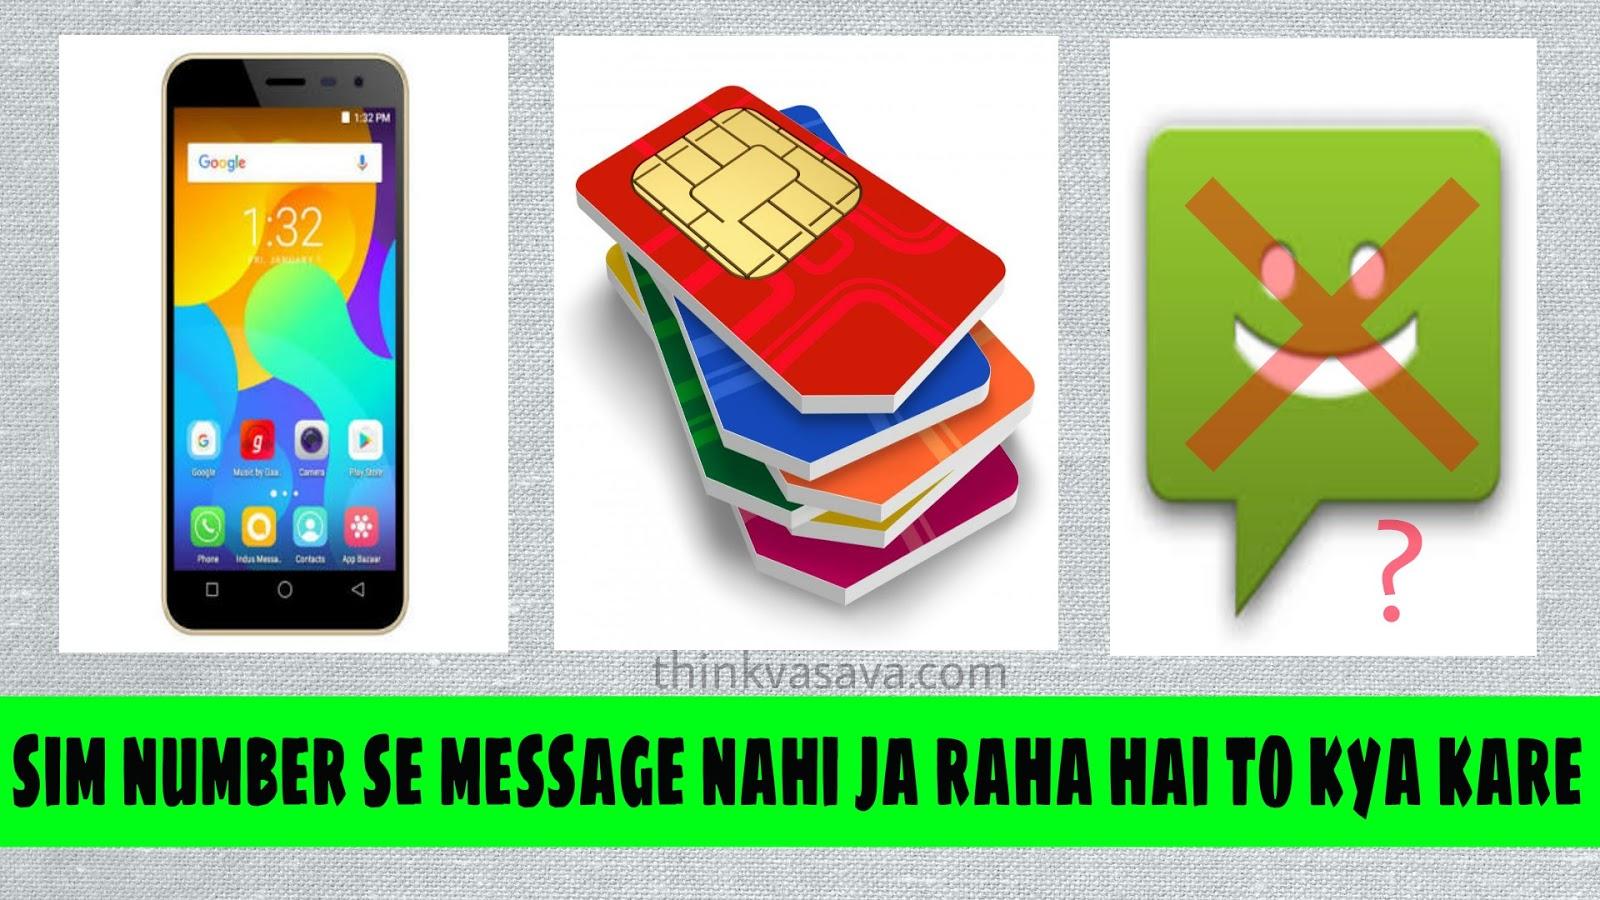 Mobile me mojud Sim Number se message nahi ja raha hai to